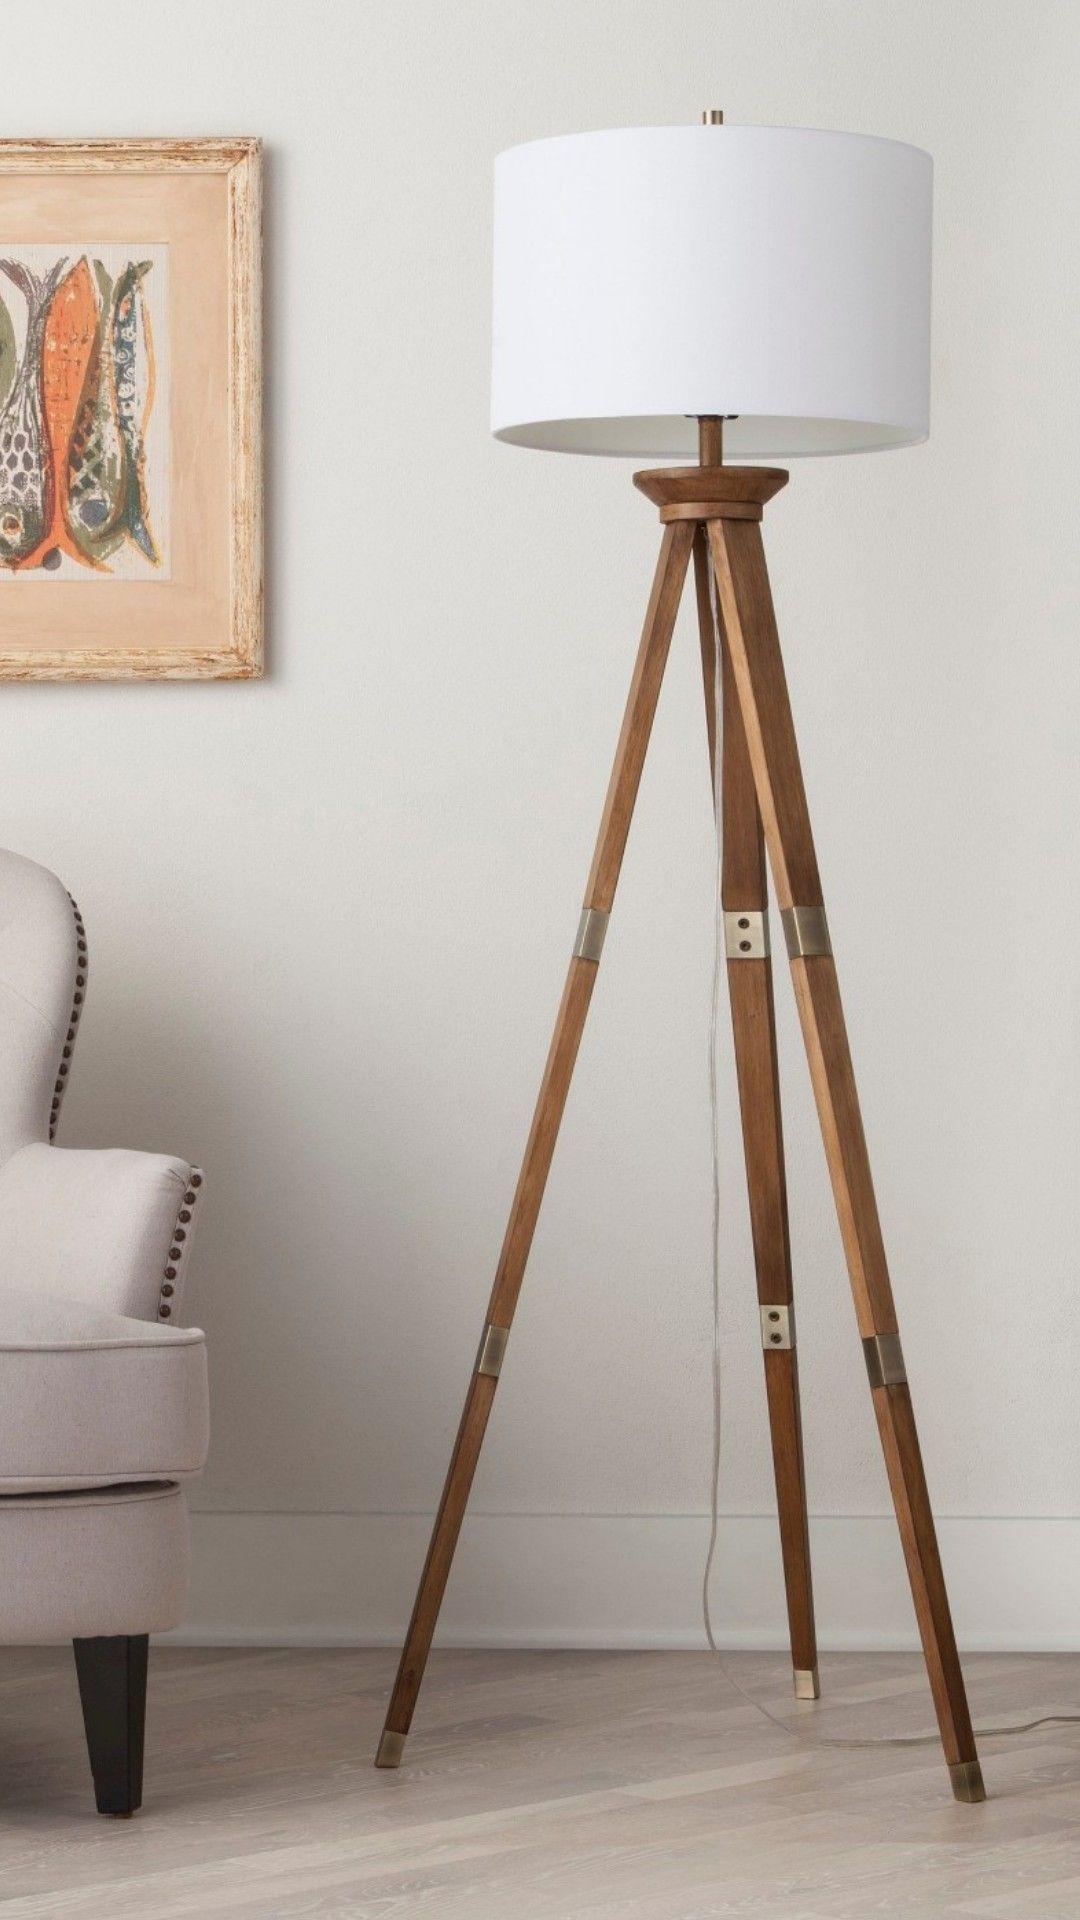 Oak Wood Tripod Floor Lamp Brass Includes Energy Efficient